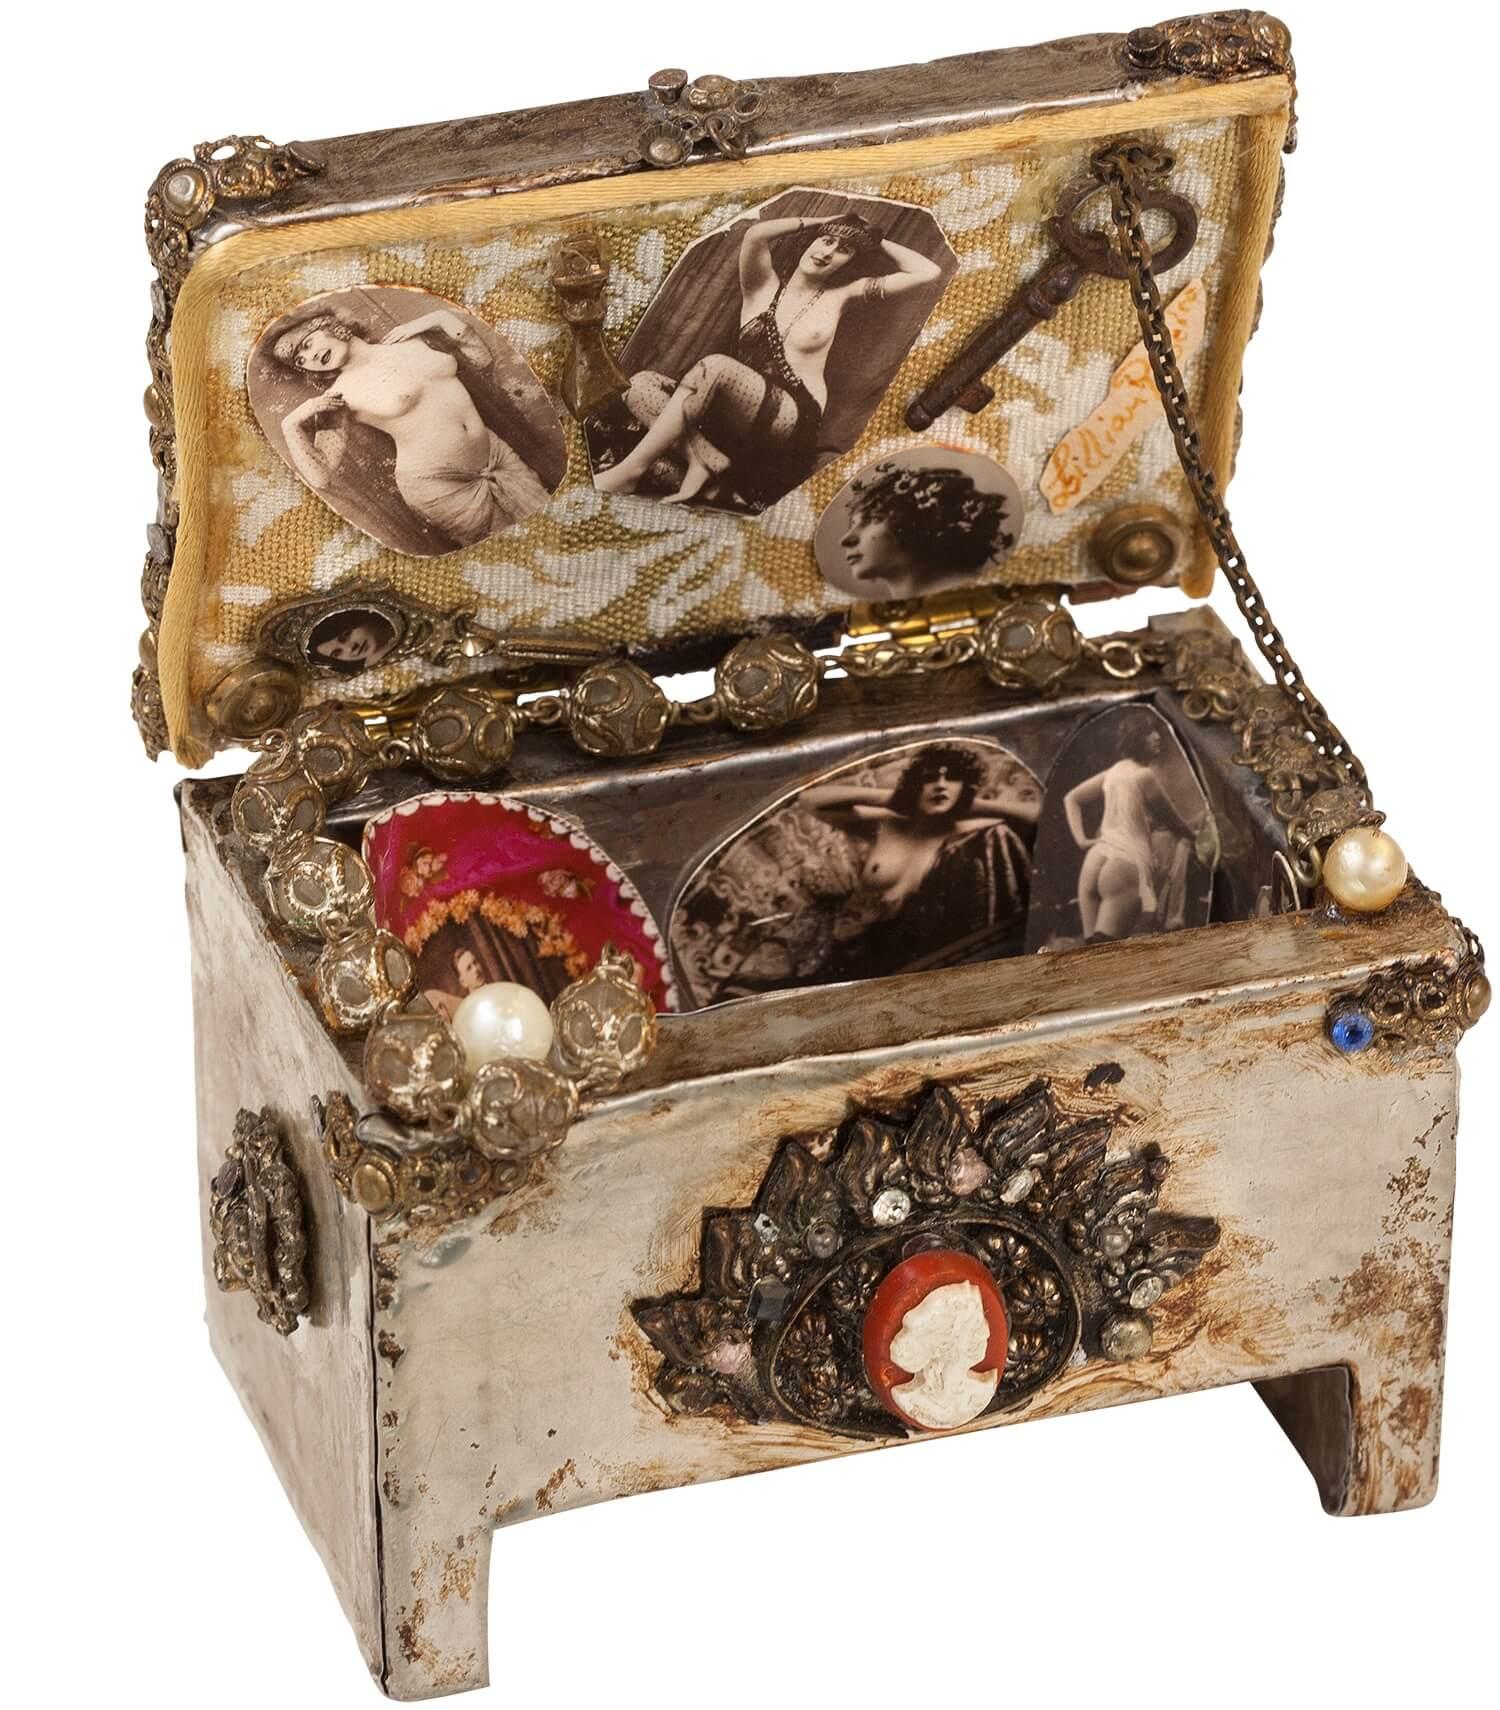 Liliana Ribeiro Andrade - Nostalgia Box, 1995 - Mexico